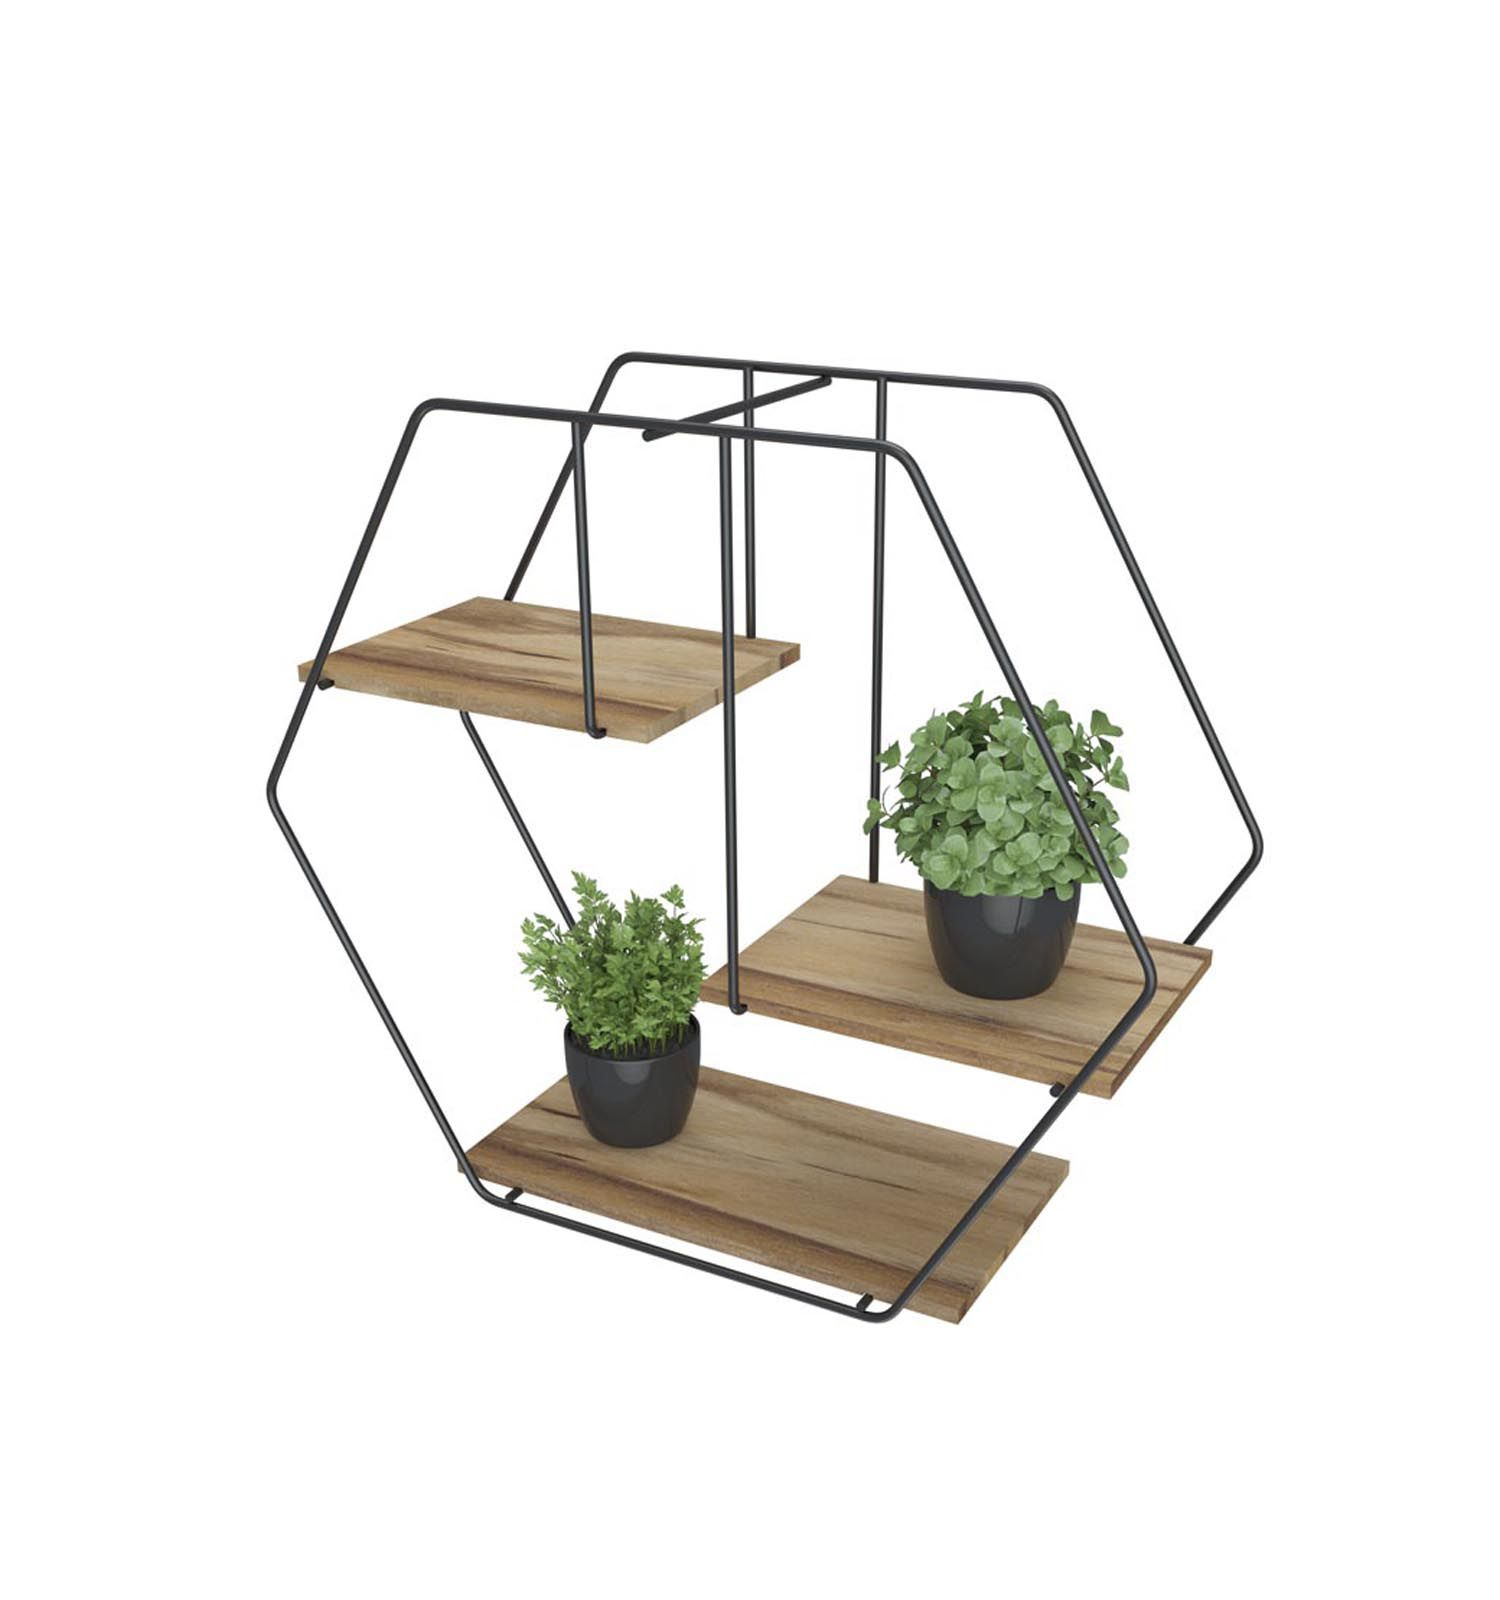 Prateleira Decorativa Hexagonal